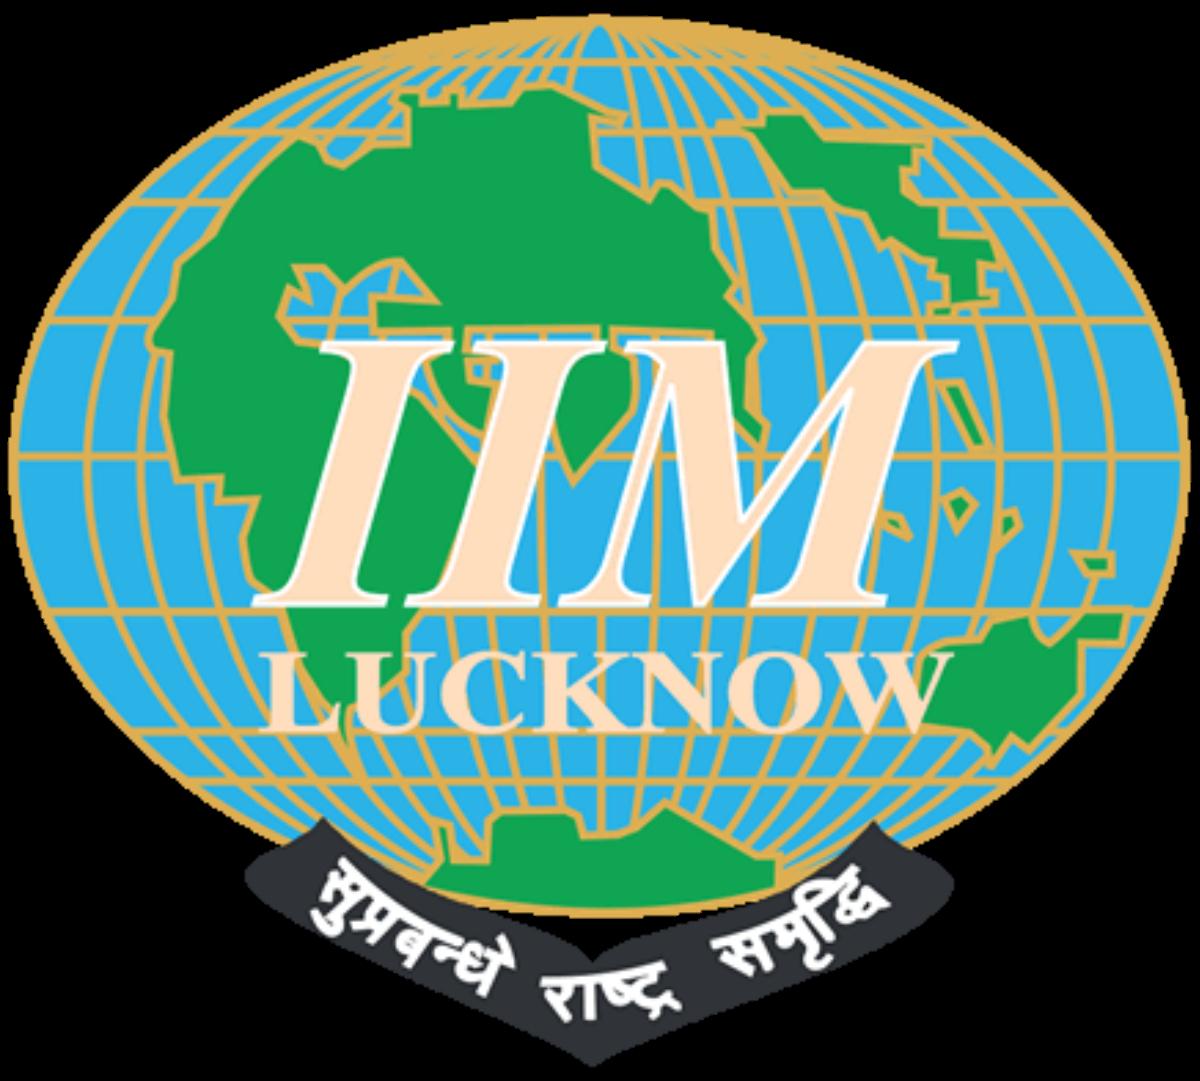 IIM Lucknow Notification 2019